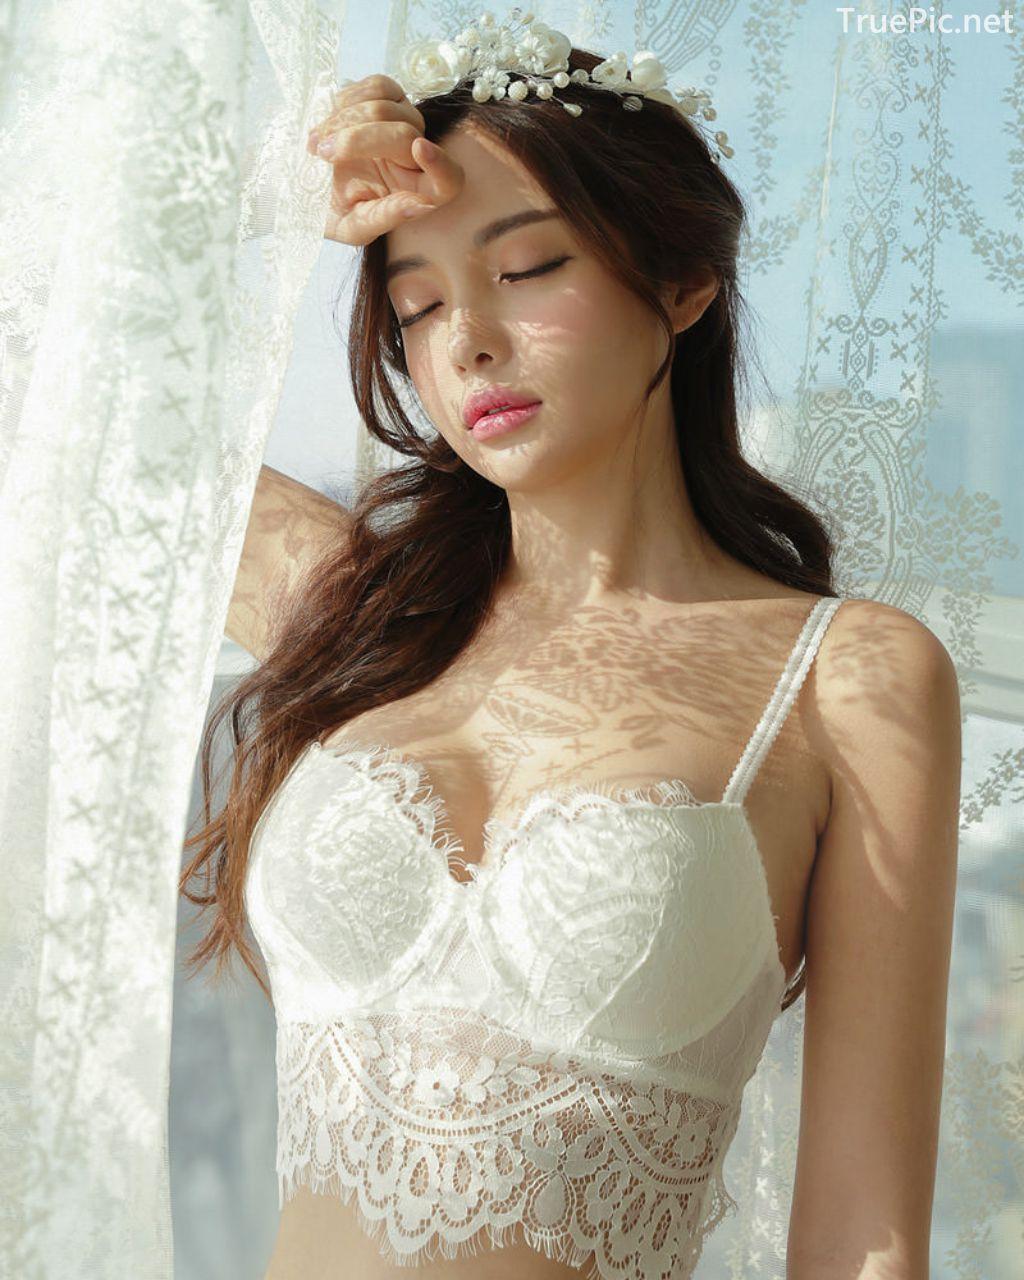 Korean Fashion Model - Jin Hee - Lovely Soft Lace Lingerie - TruePic.net - Picture 3